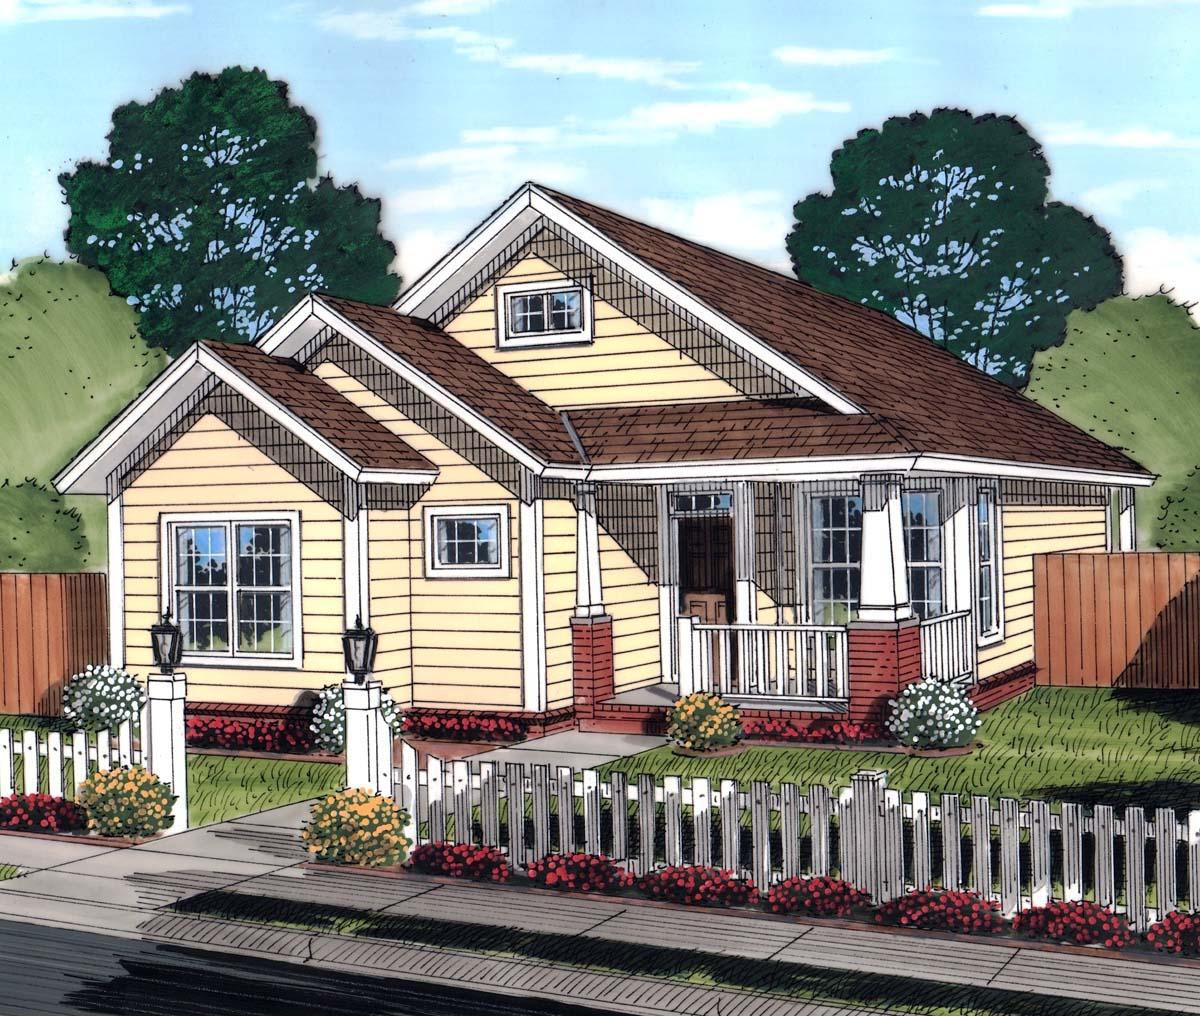 House Plan 61451 at FamilyHomePlanscom